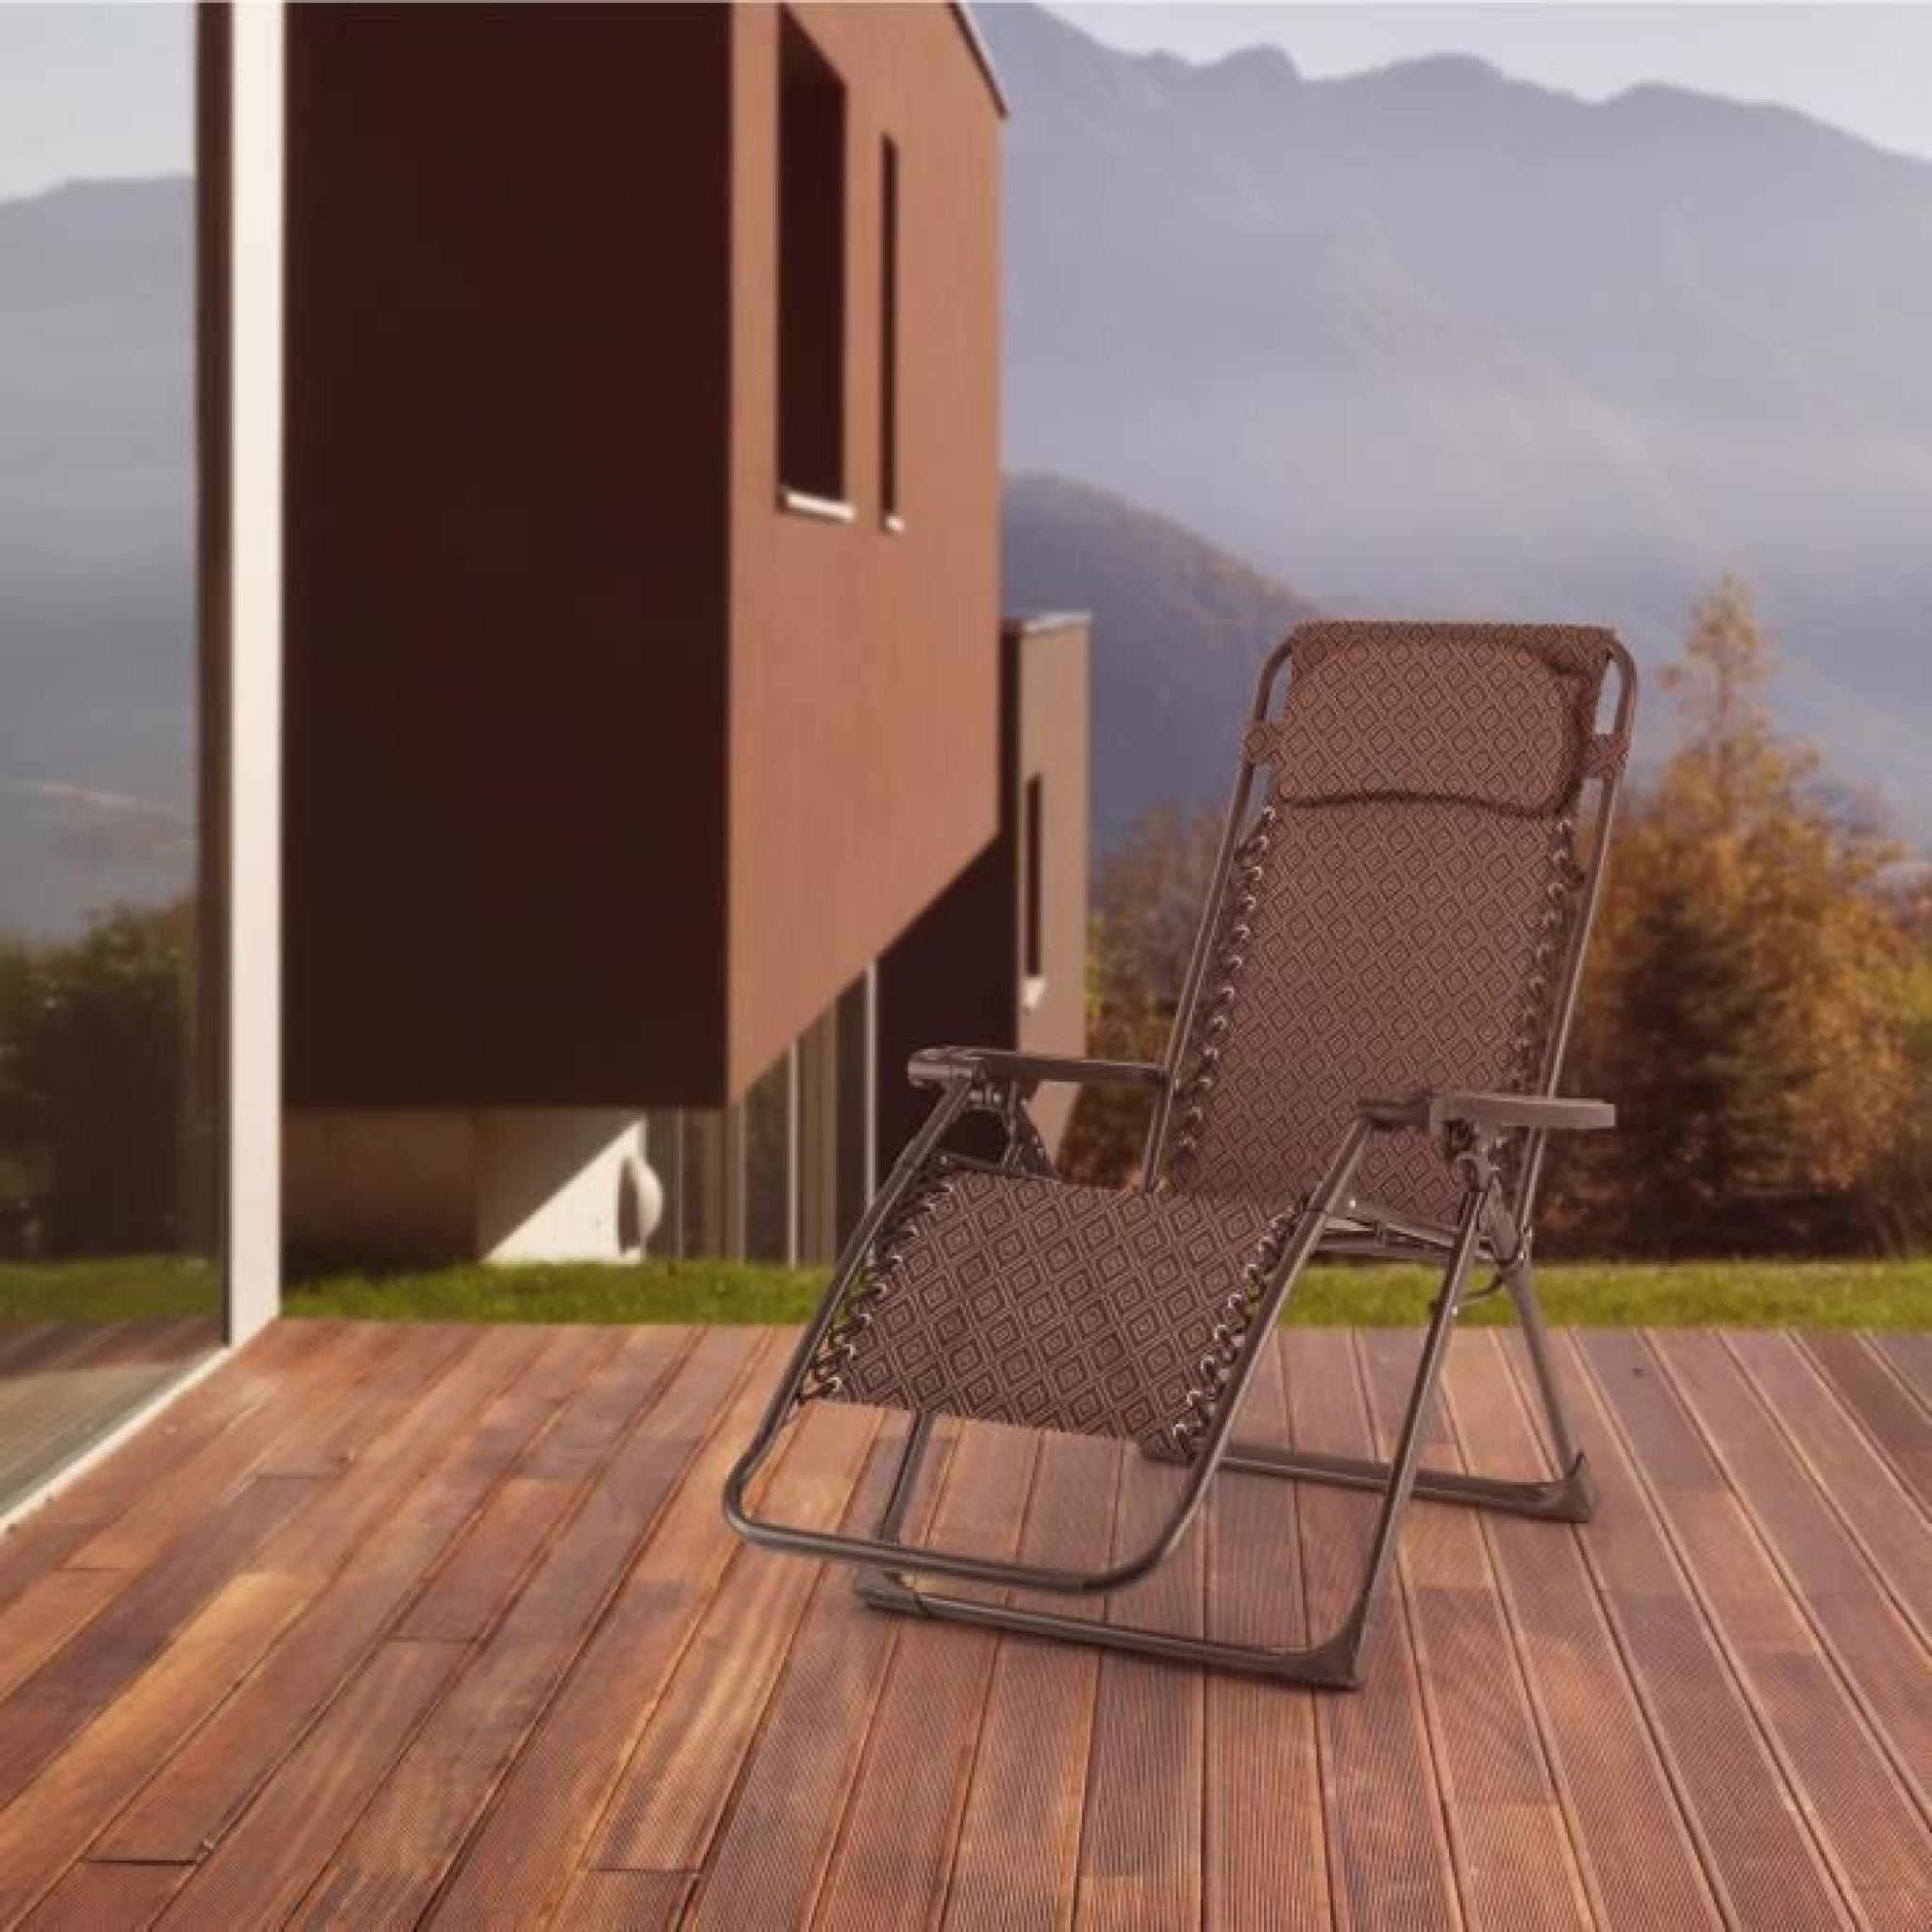 blumfeldt california red chaise longue de jardin pliable. Black Bedroom Furniture Sets. Home Design Ideas